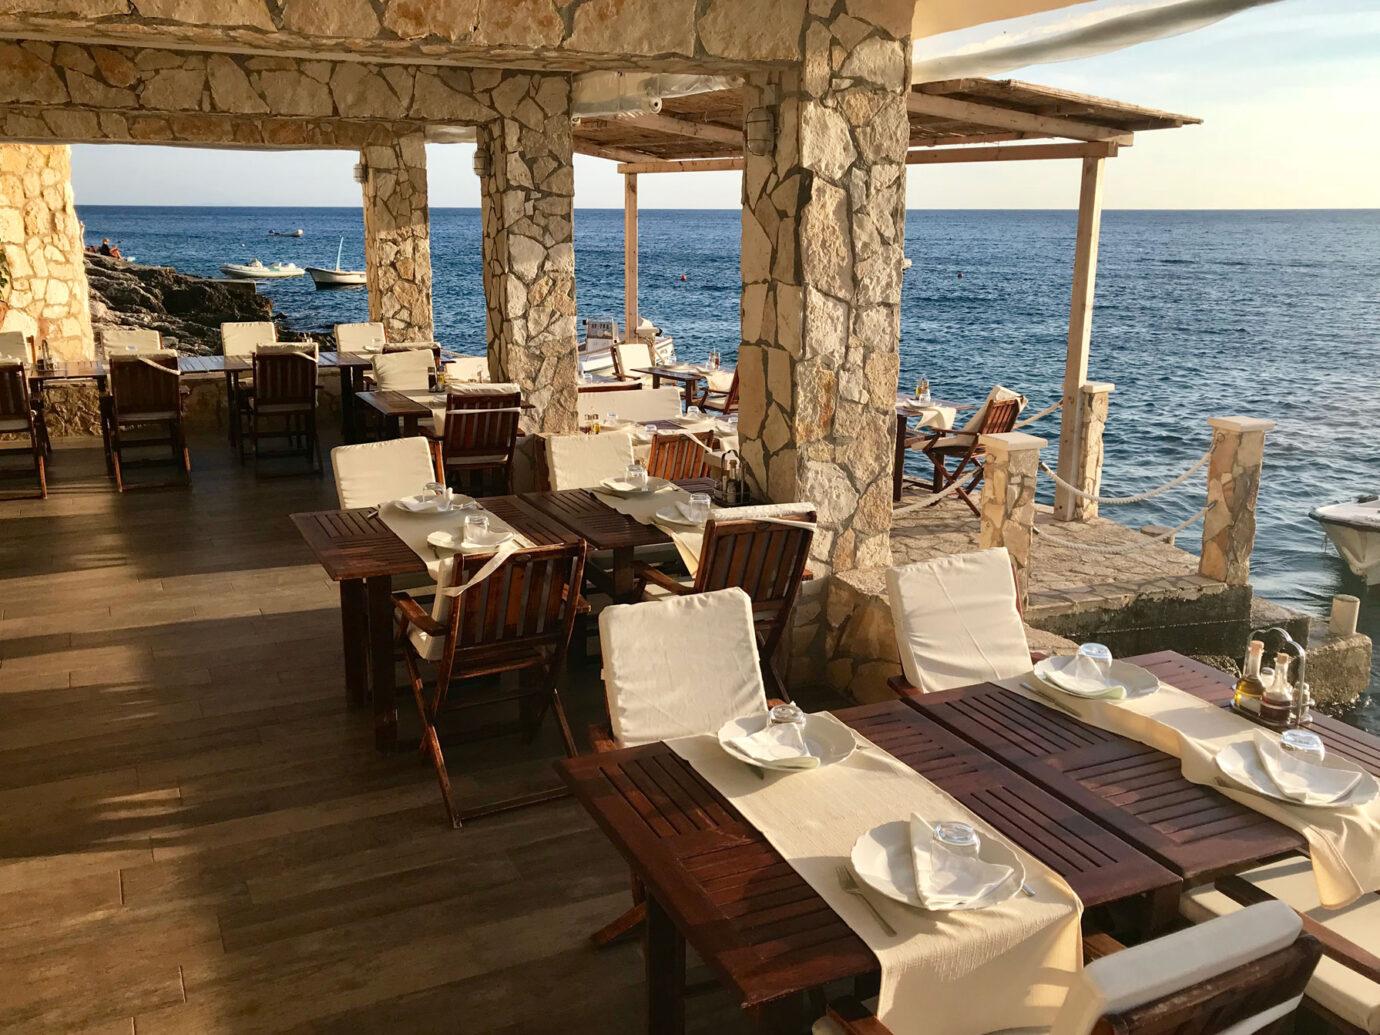 Outdoor dining area at Konoba Kotin Restaurant, Hvar Croatia